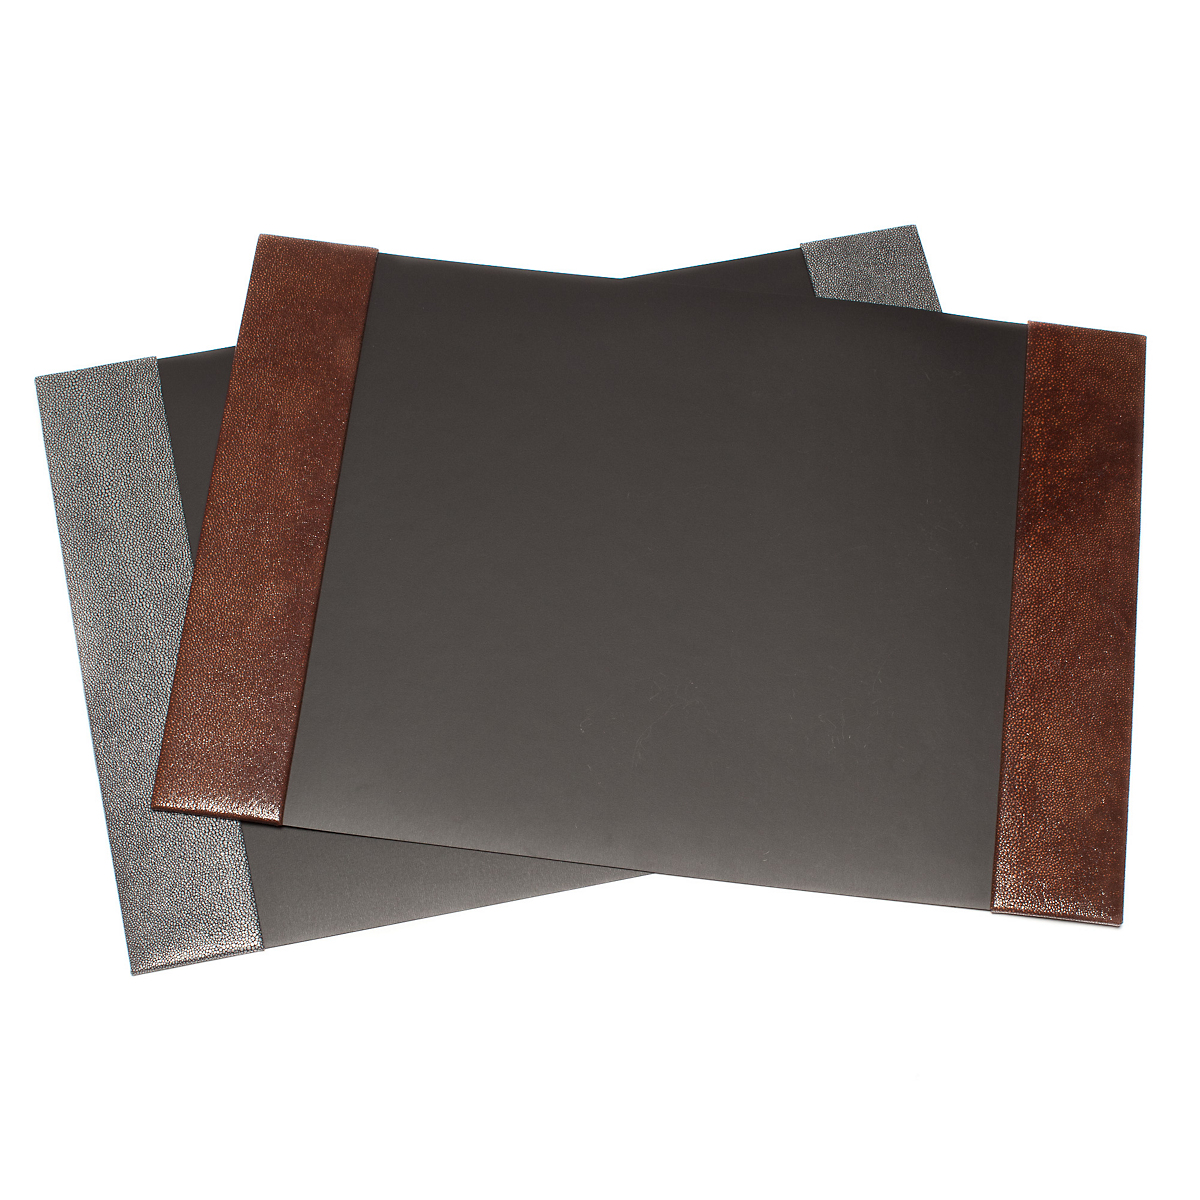 graphic image shagreen desk blotter large - Desk Blotter